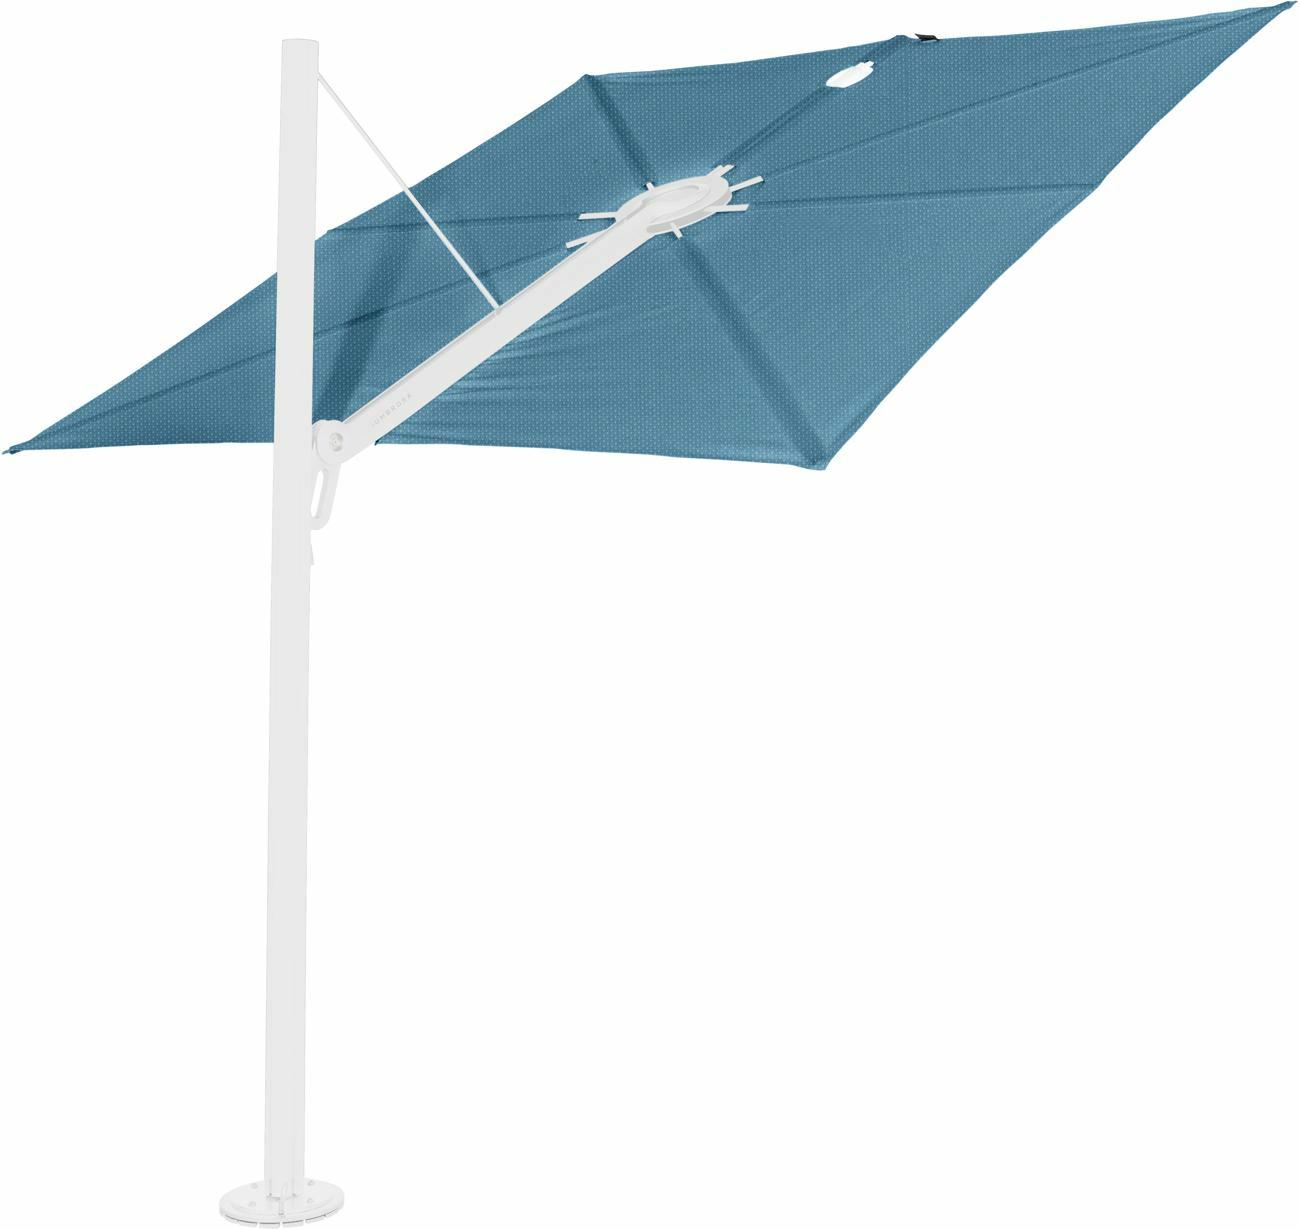 Spectra cantilever umbrella straight 90°